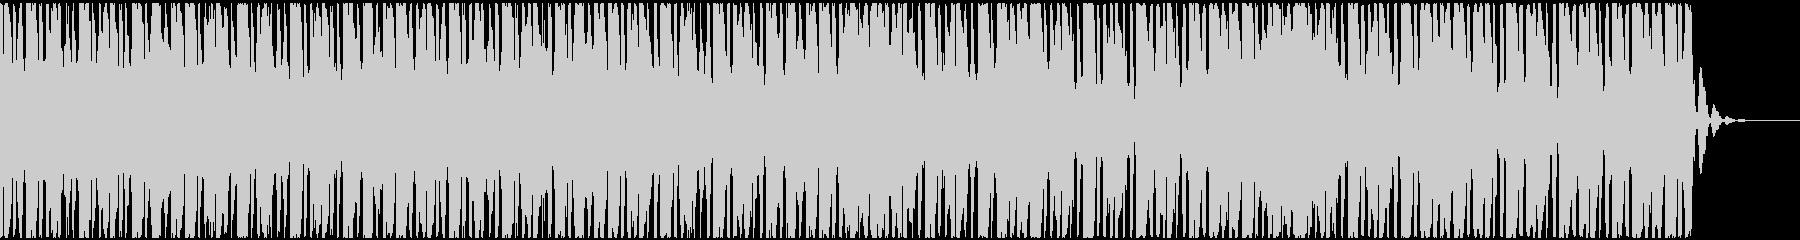 【EDM】トランス、ミディアム3の未再生の波形